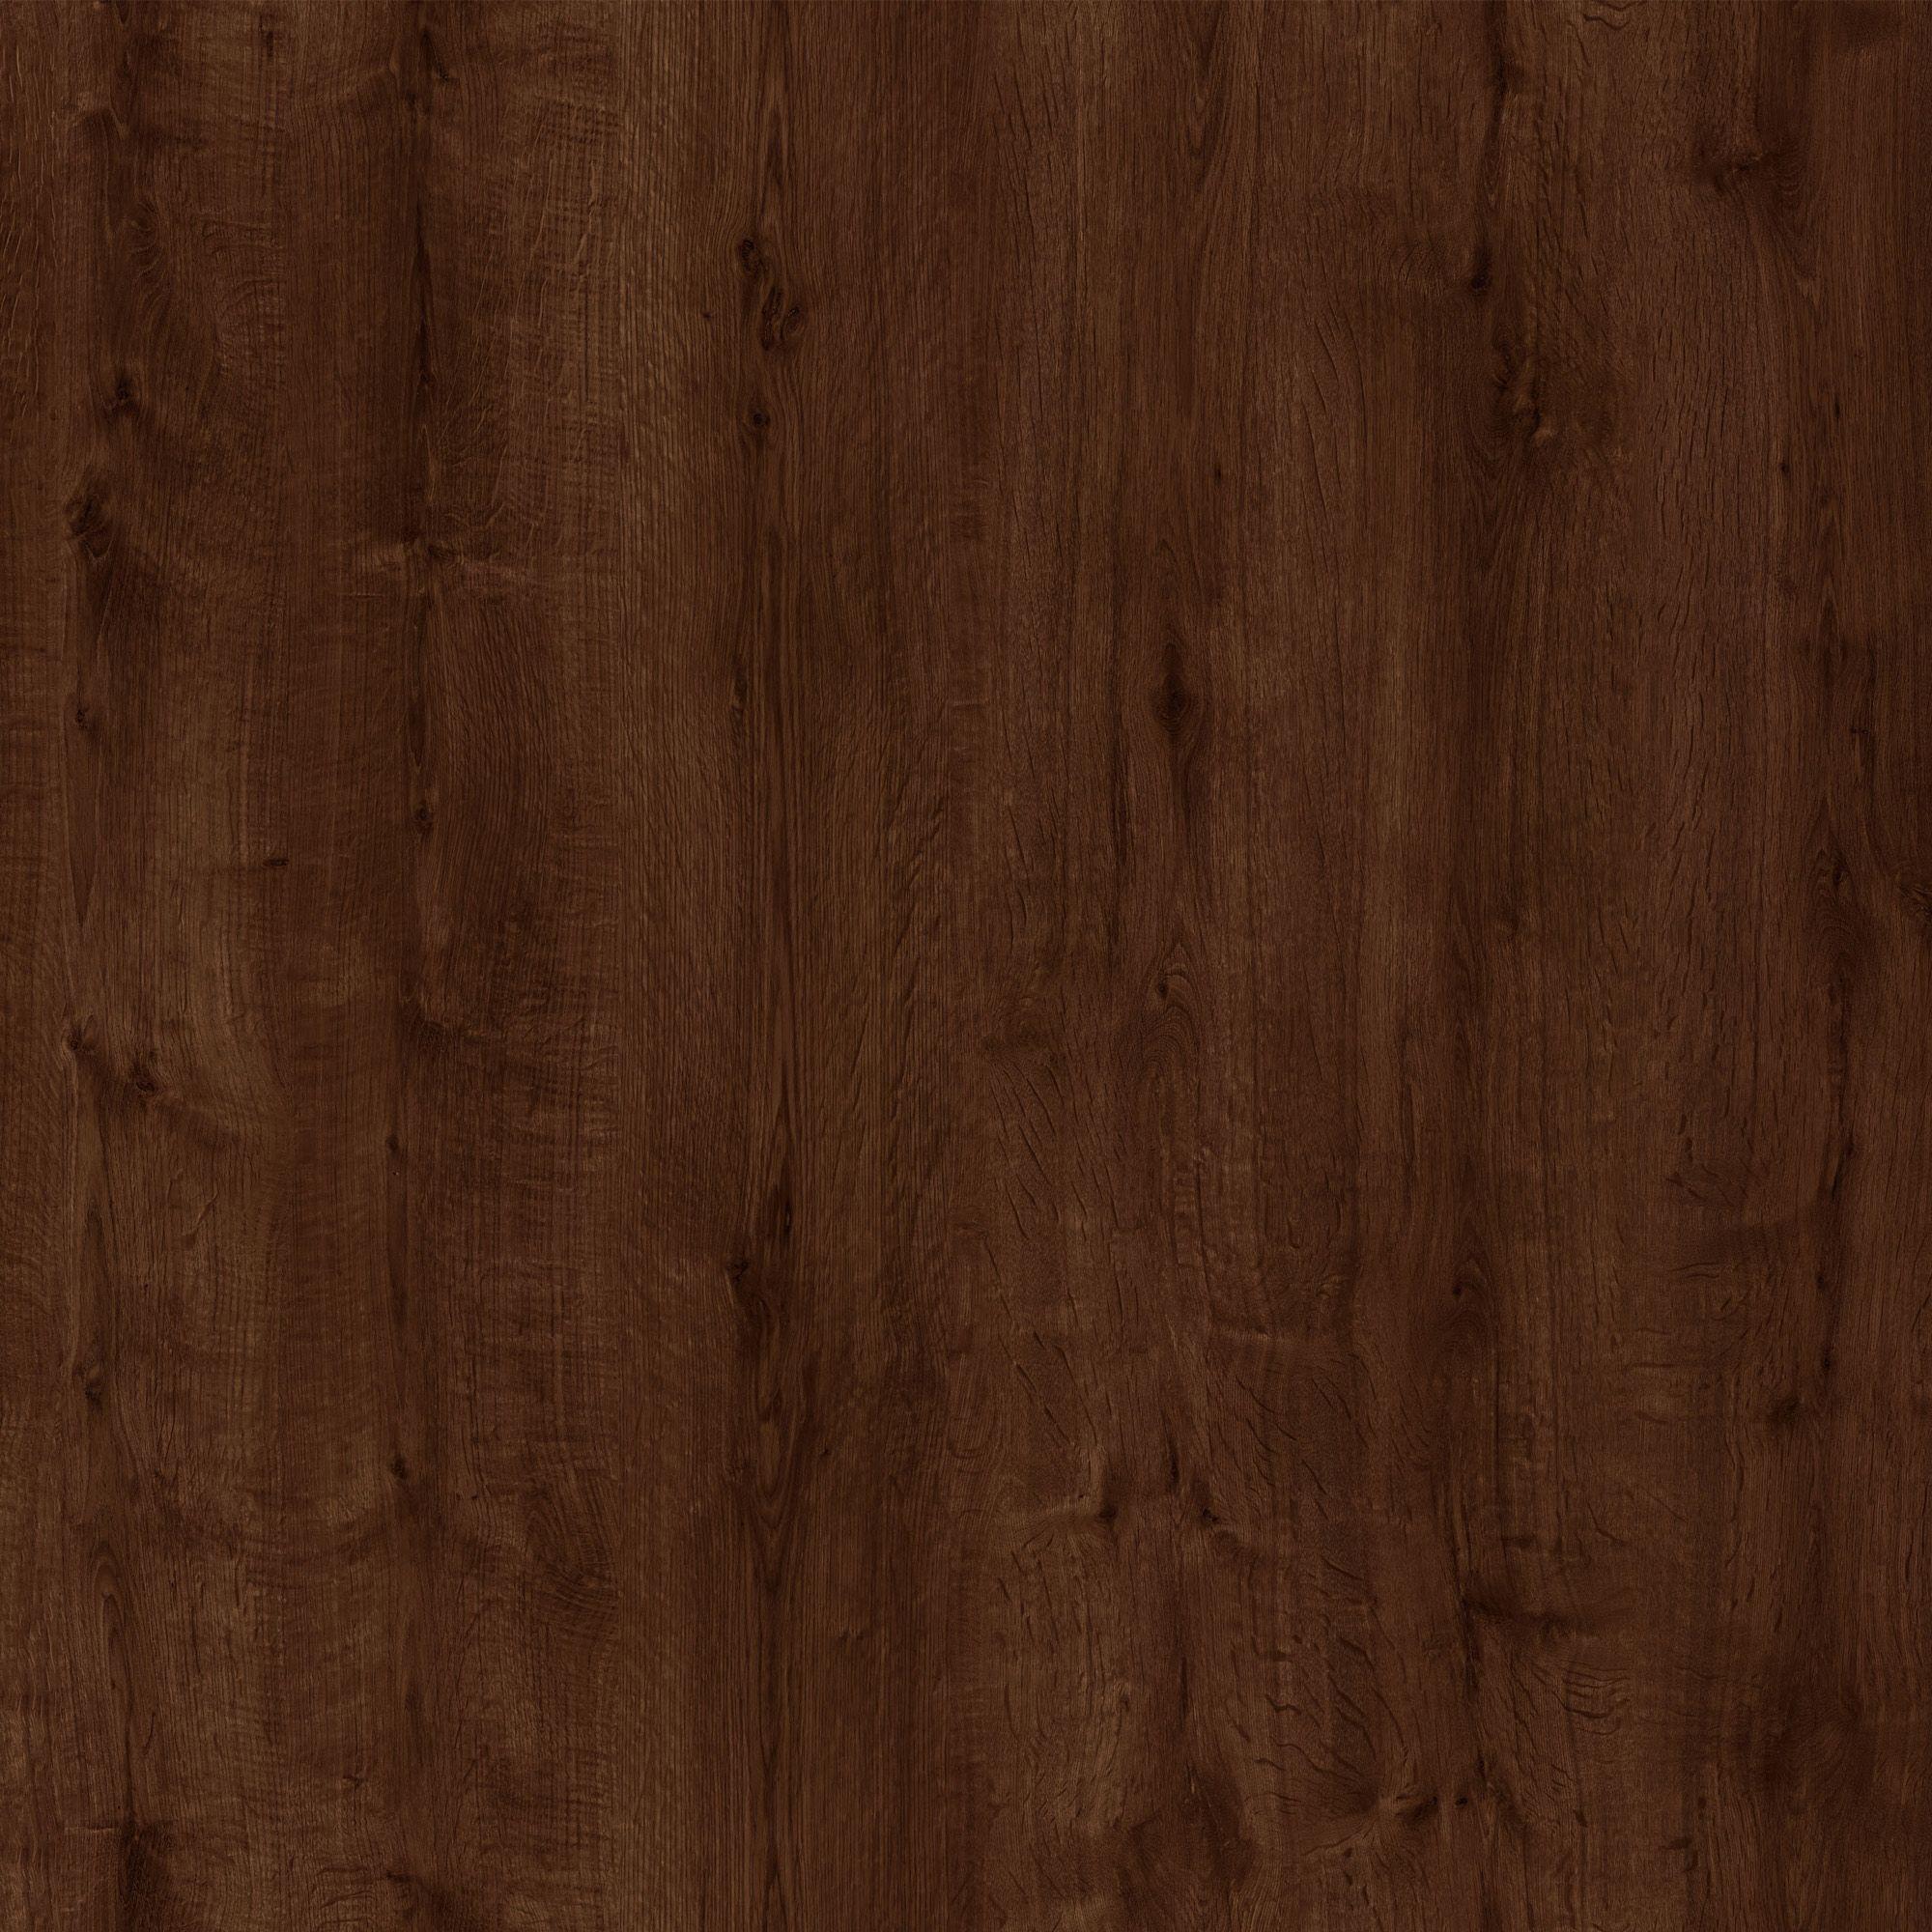 Amazing Custom Bath Vanities Chicago Big Bath Clothes Museum Regular Replace Bathroom Fan Light Bulb Can I Use A Whirlpool Bath When Pregnant Old Gay Bath House Fort Worth OrangeTop 10 Bathroom Faucet Brands Concertino Prestige Dark Oak Effect Laminate Flooring 1.48 M² Pack ..